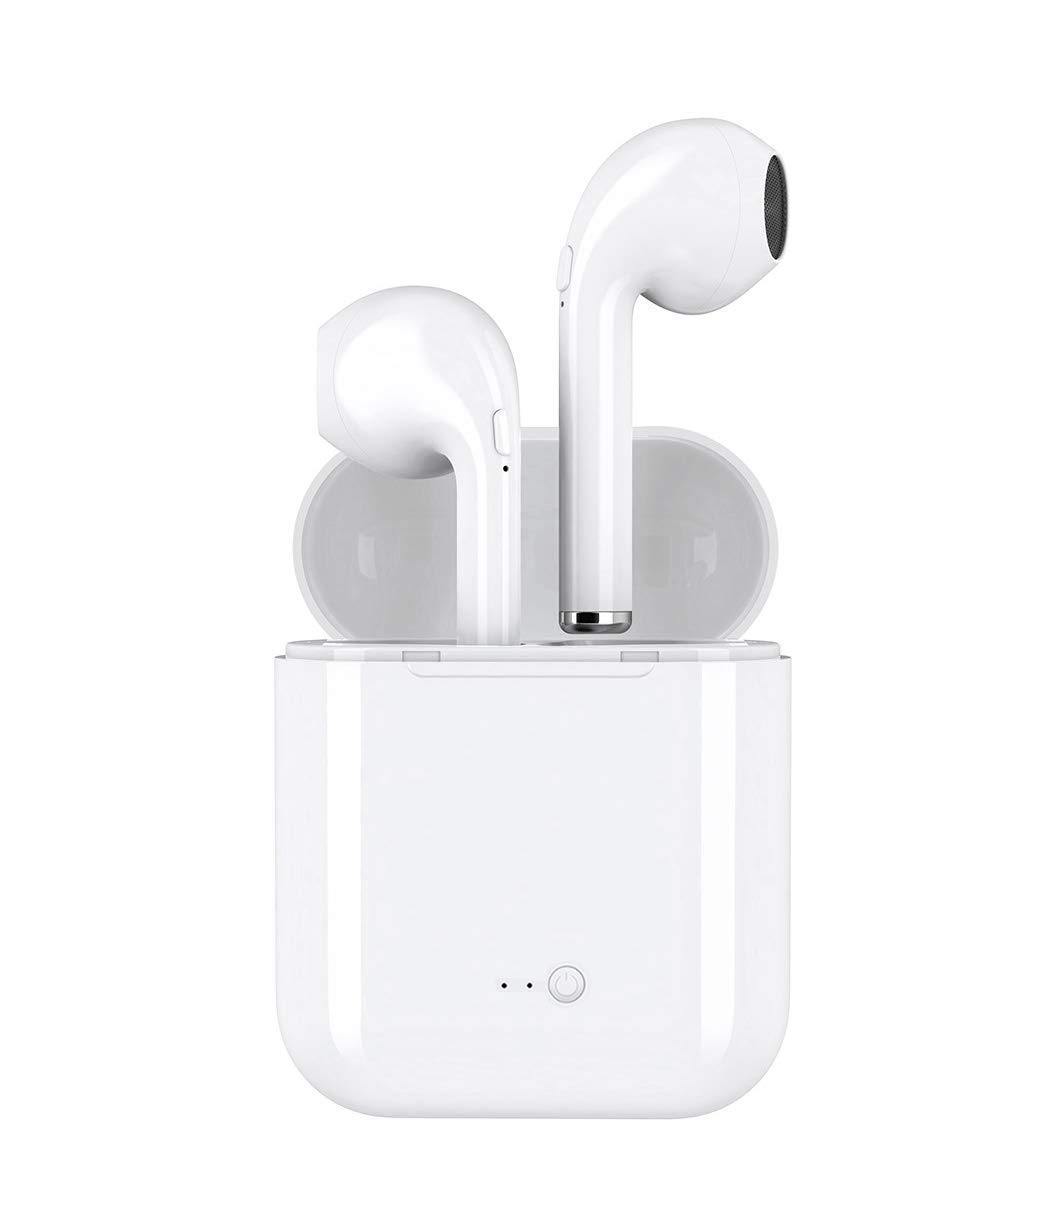 TJSDAN Bluetooth Headset, Wireless Headset Sports Headset in-Ear Headphones Noise Reduction Headset Mini Headset, HiFi Headset with Microphone, Compatible with Smart Phone